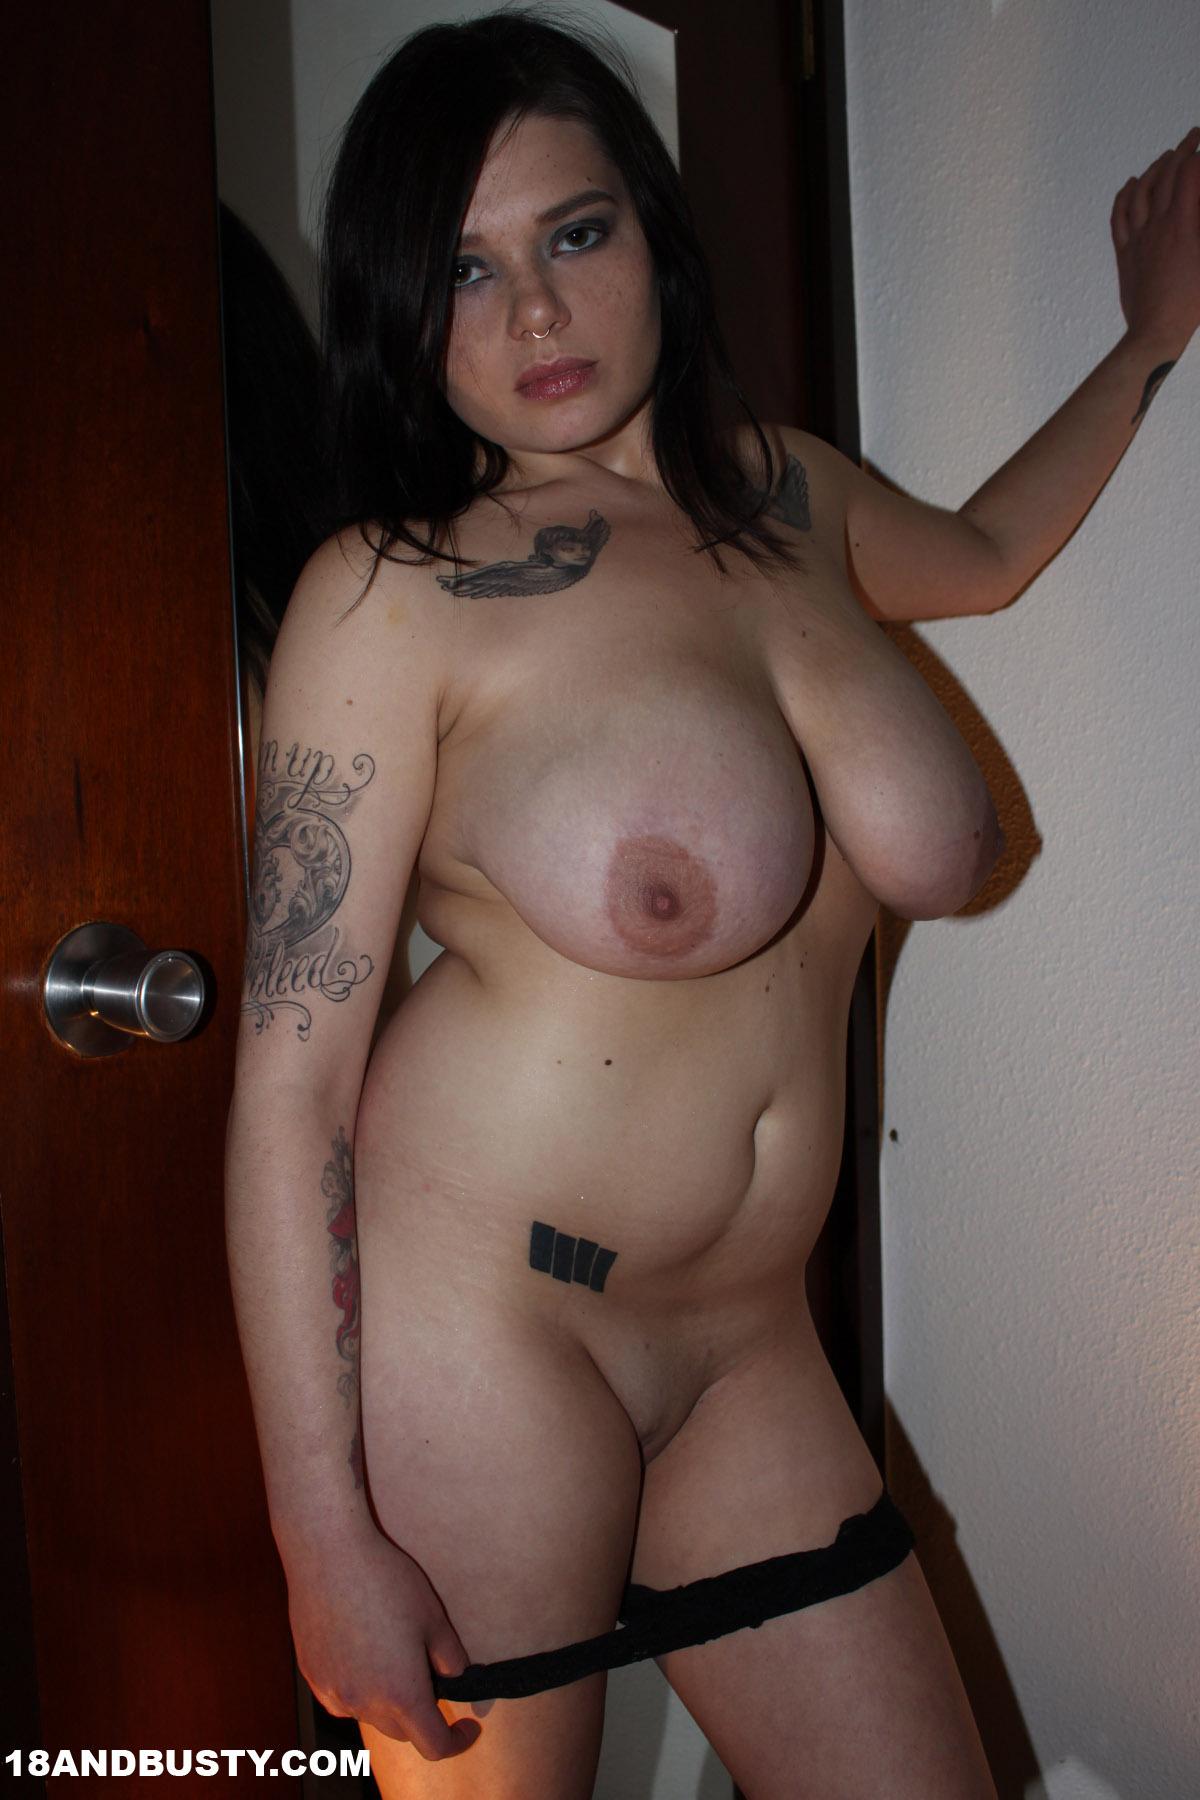 Татьяна абрамова фото голышом них